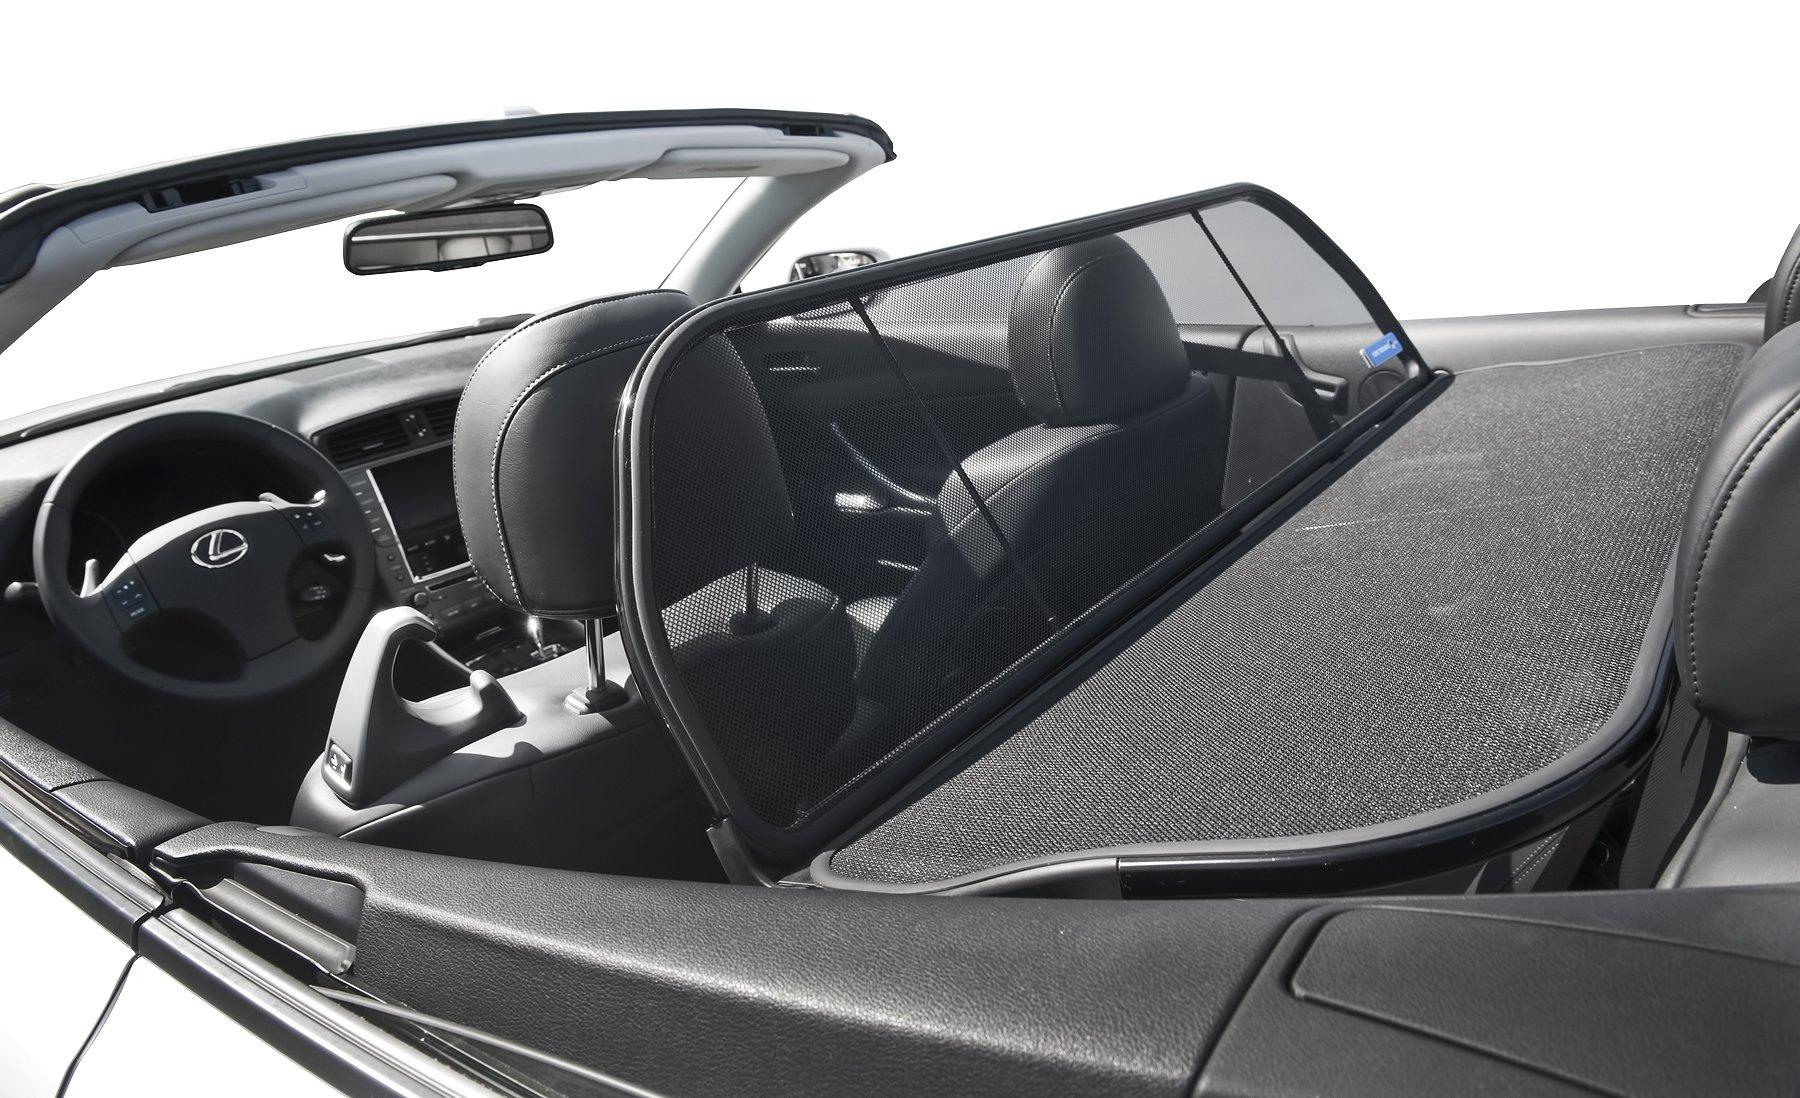 Lexus IS 250 or 350 Love The Drive™ Wind Deflector. Wind Deflectors are as known as Windscreen, Windstop, Wind Blocker & Wind Jammer